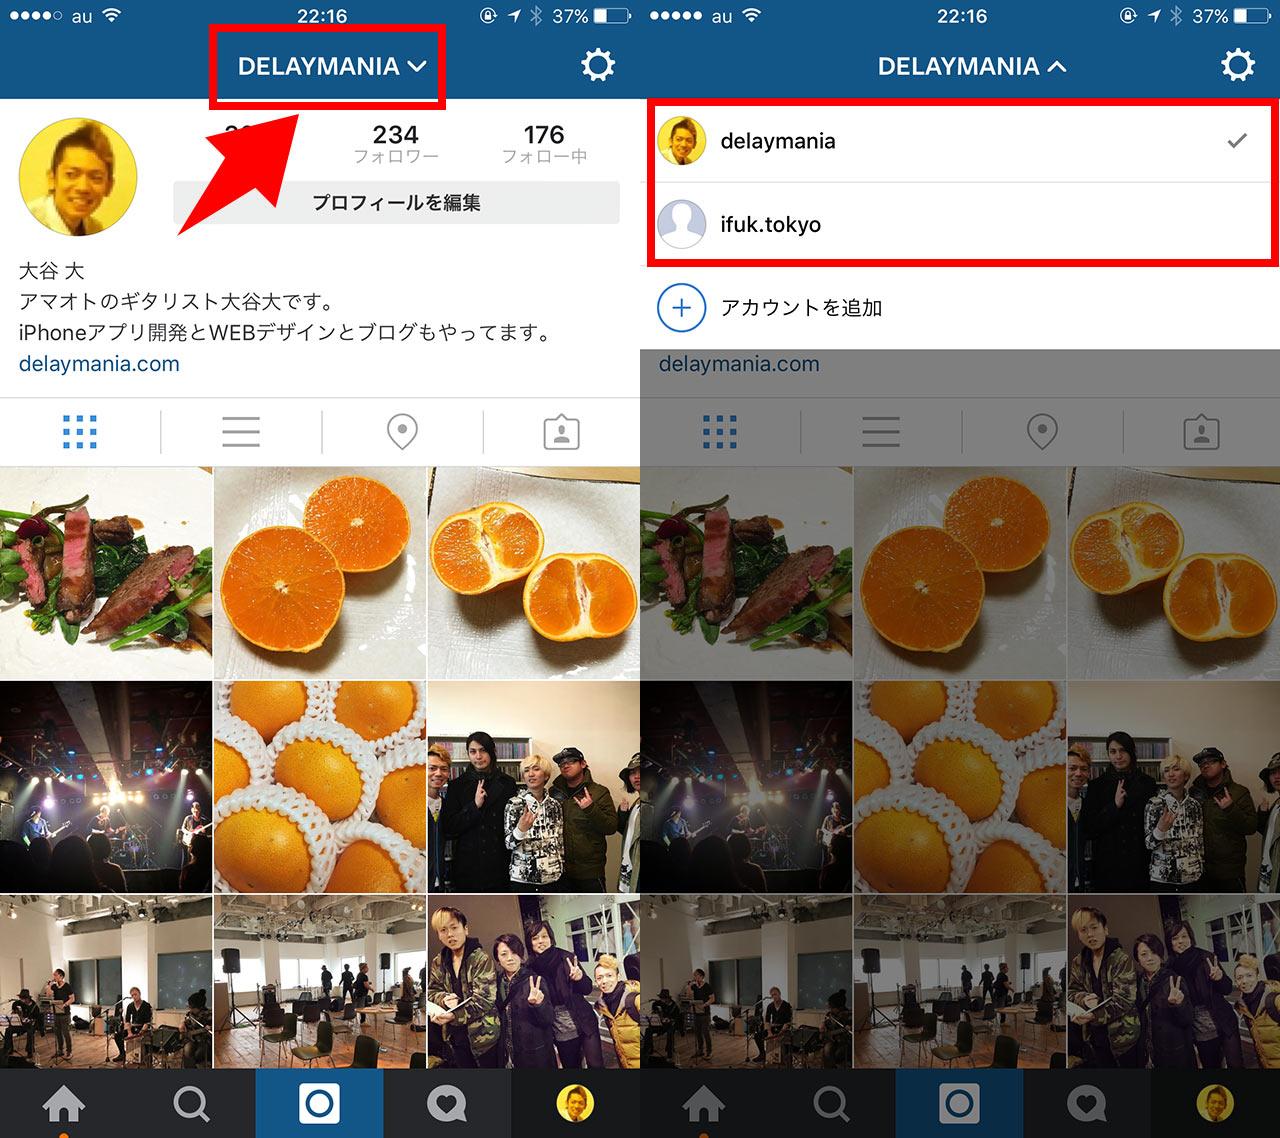 Instagramでアカウントを切り替える方法